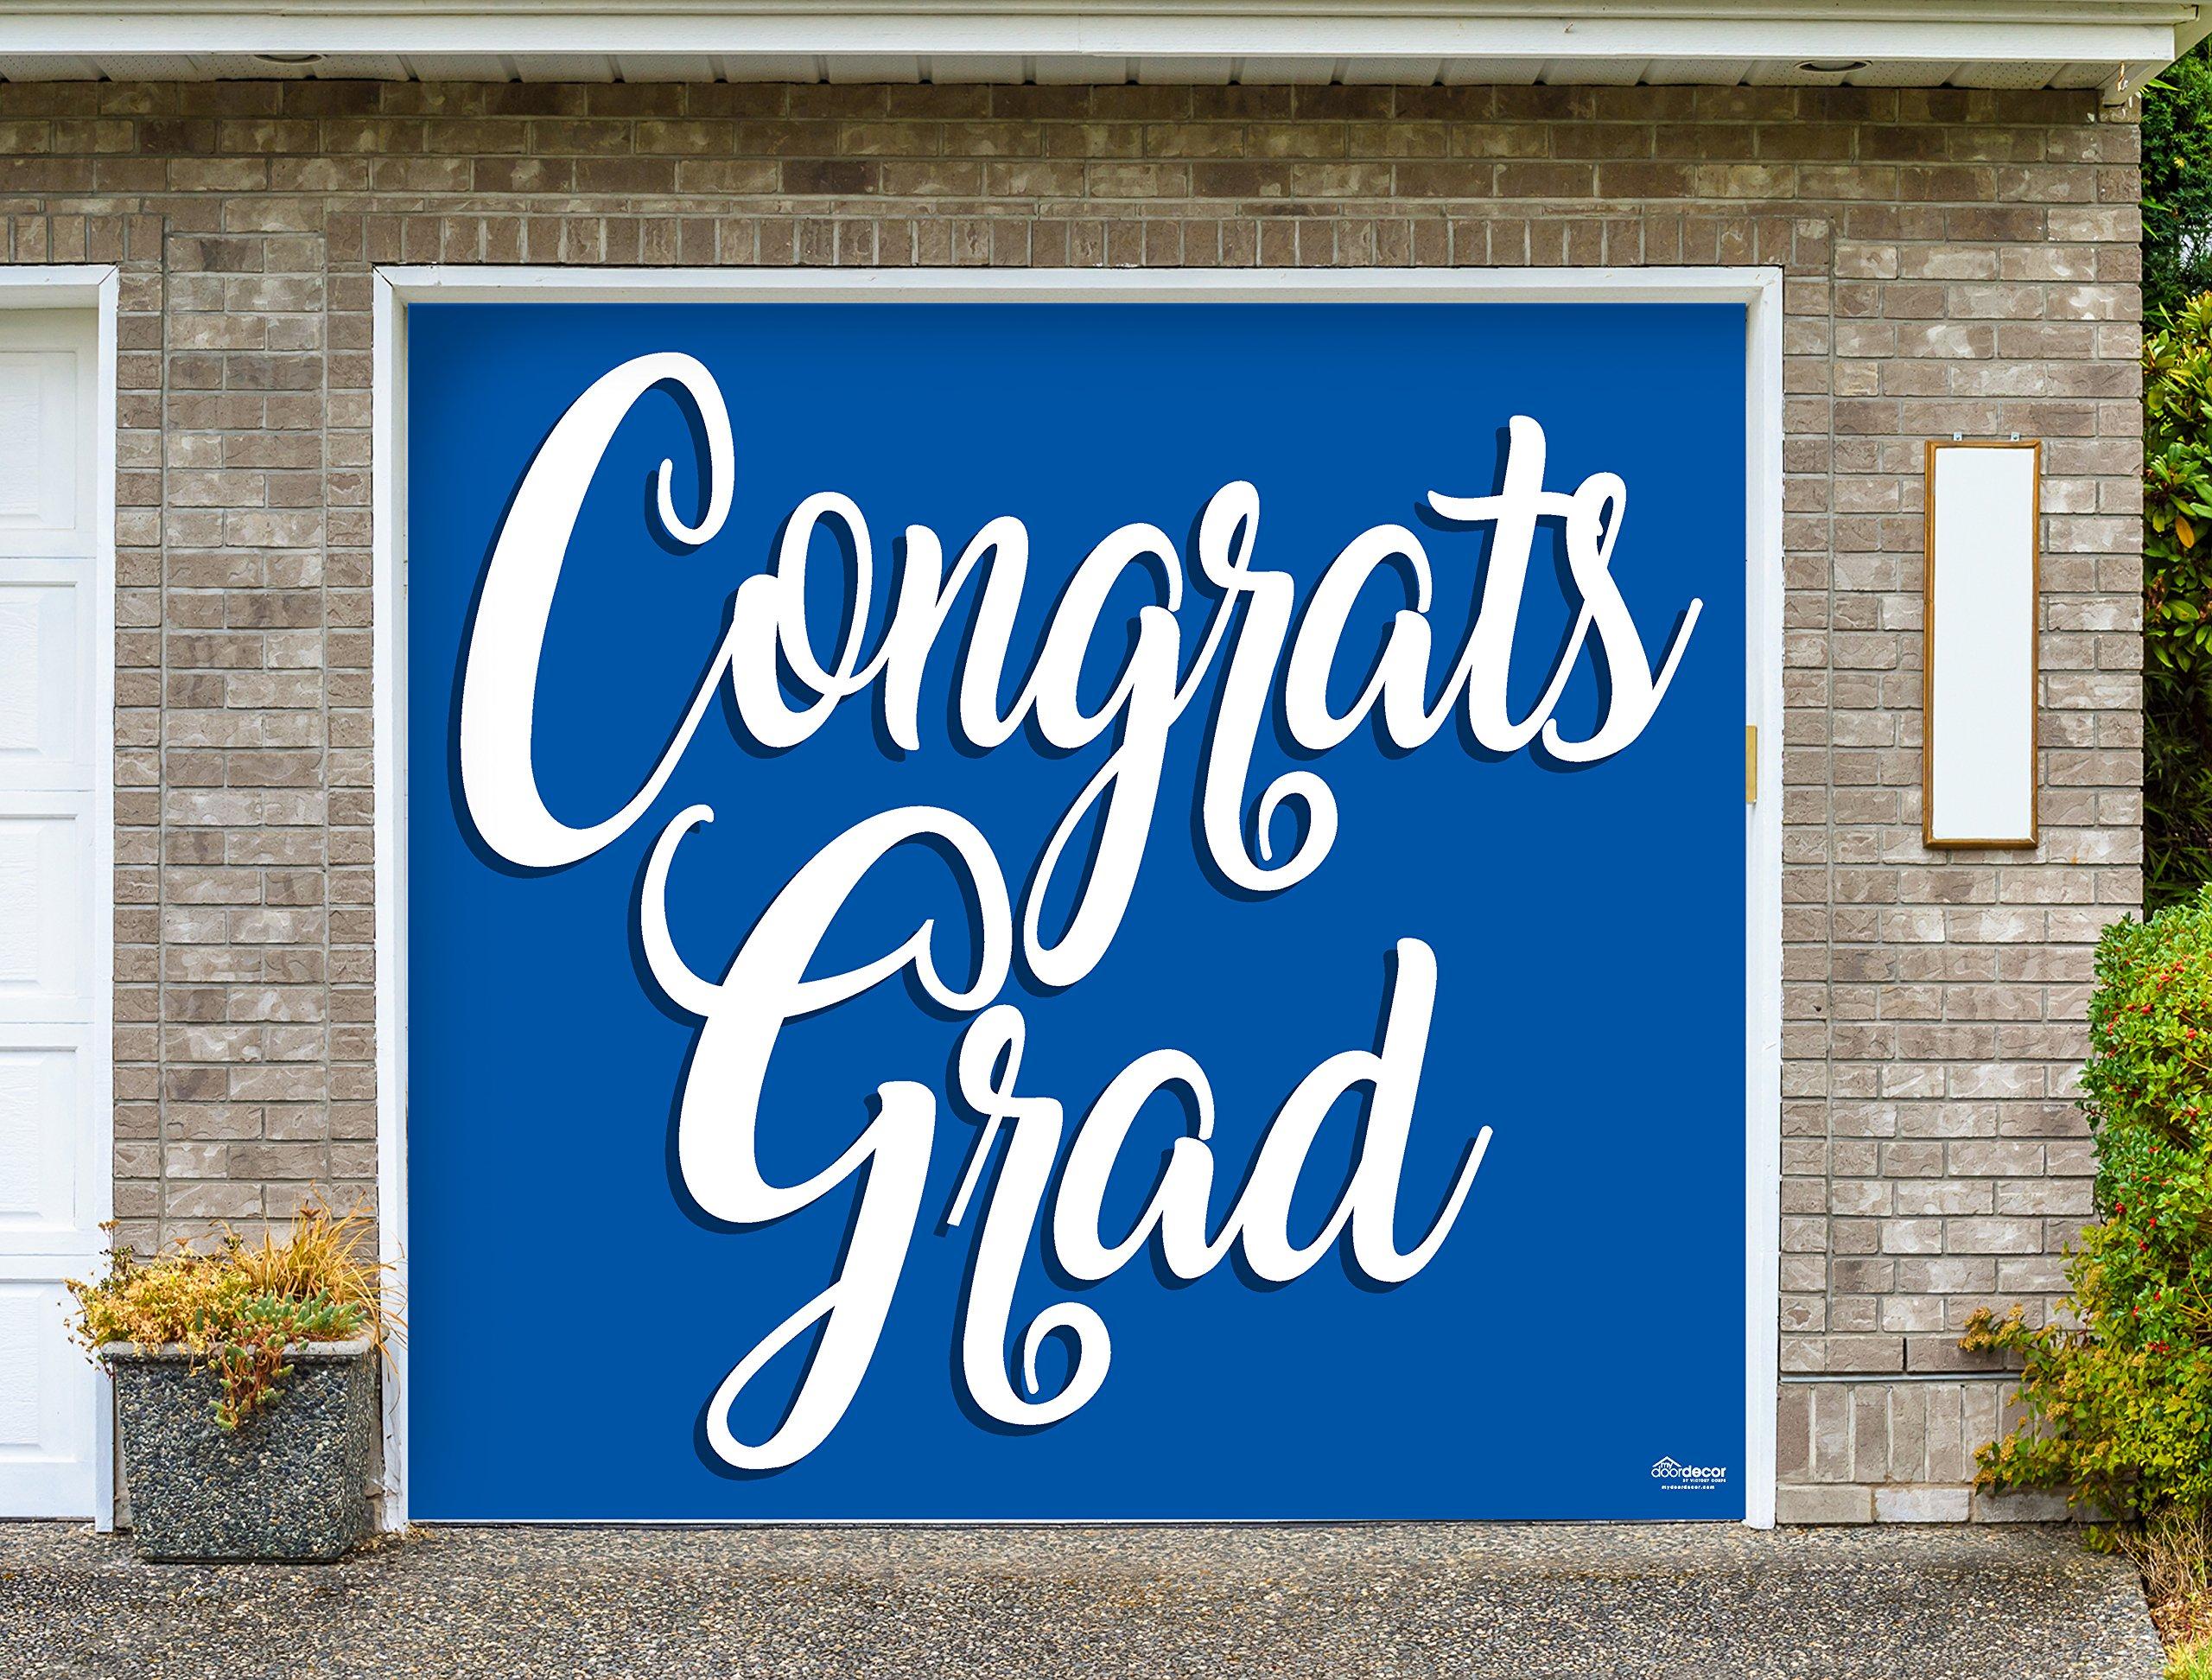 Victory Corps Congrats Grad Blue - Outdoor Graduation Garage Door Banner Mural Sign Décor 7'x 8' Car Garage - The Original Holiday Garage Door Banner Decor